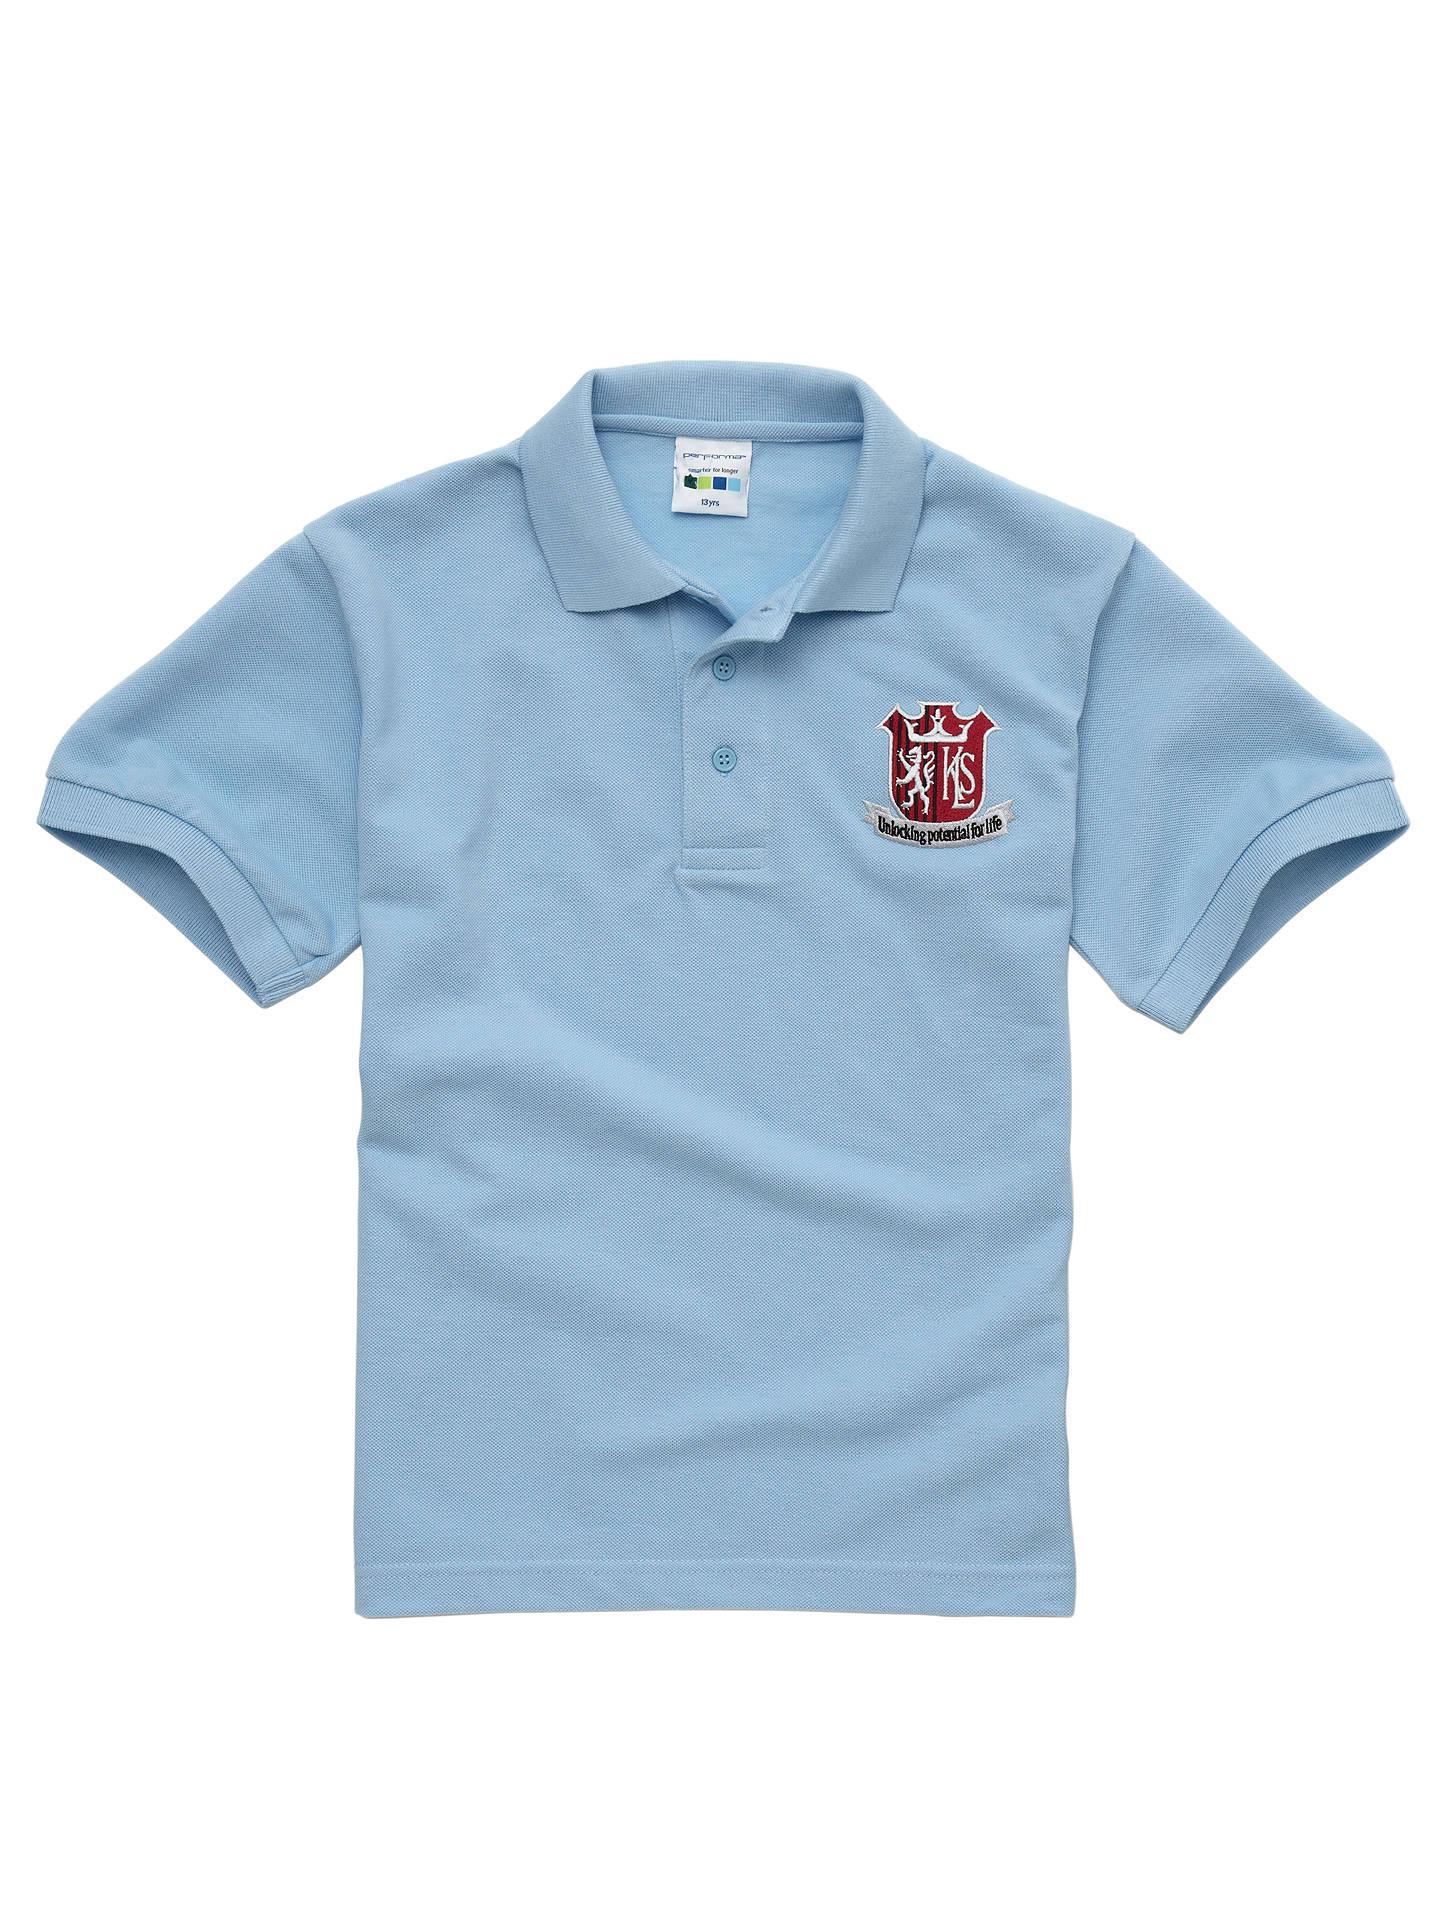 e39c7e839 Kings Langley Secondary School Unisex Sports Polo Shirt at John ...